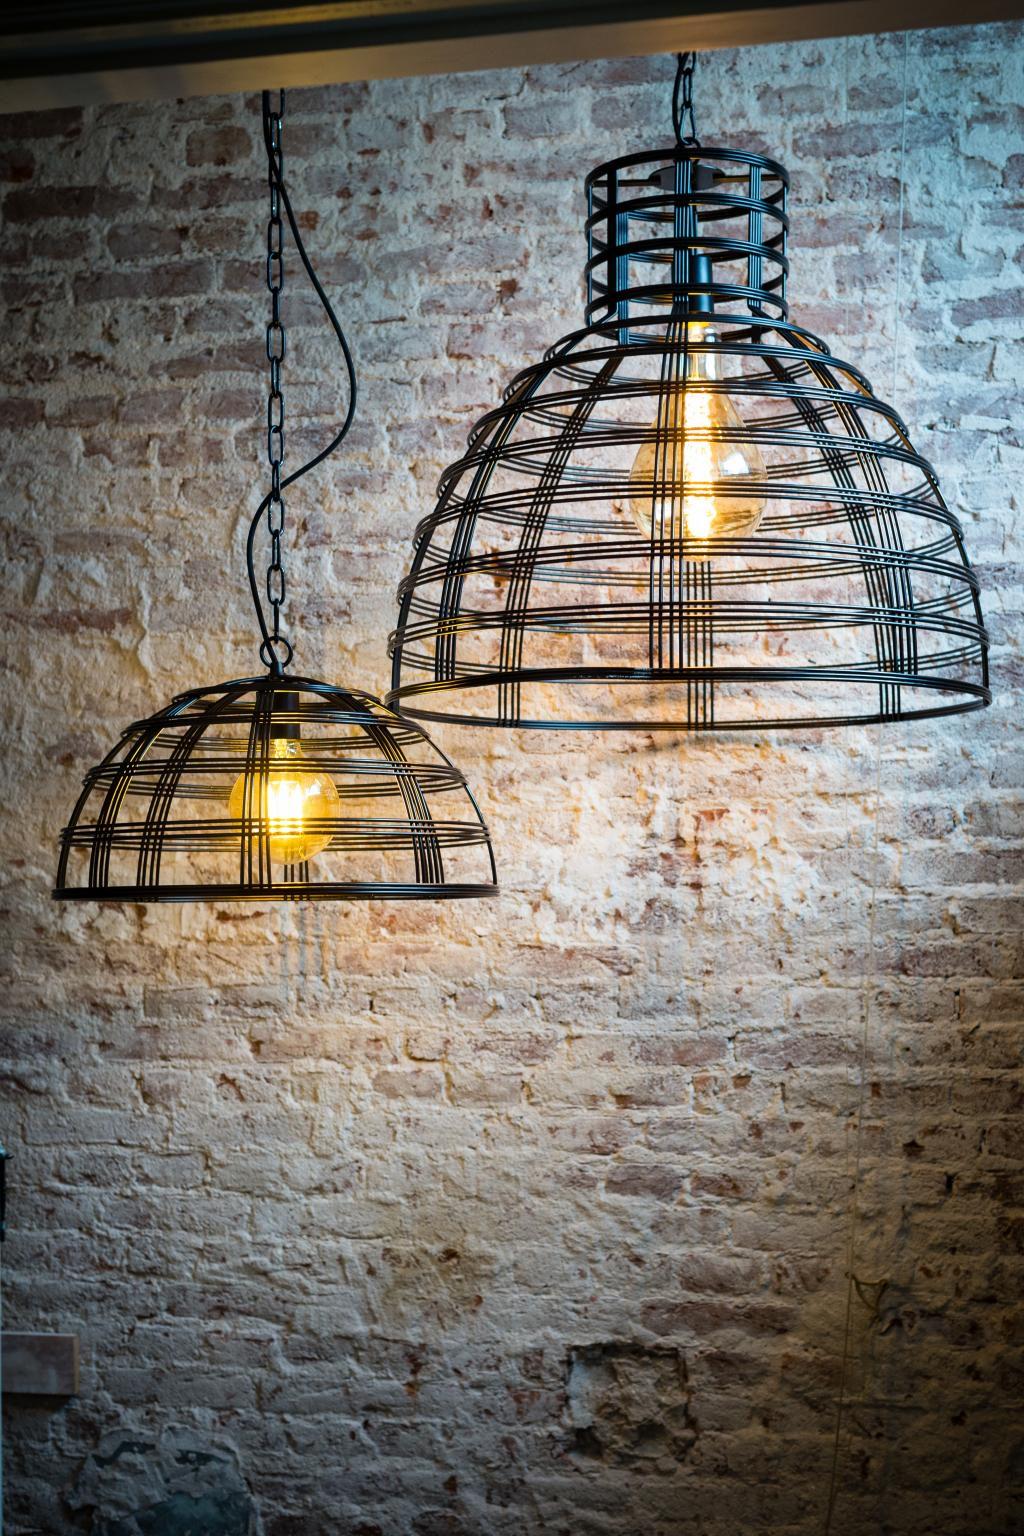 hanglamp barletta draadlamp zwart 70cm max155cm eth. Black Bedroom Furniture Sets. Home Design Ideas